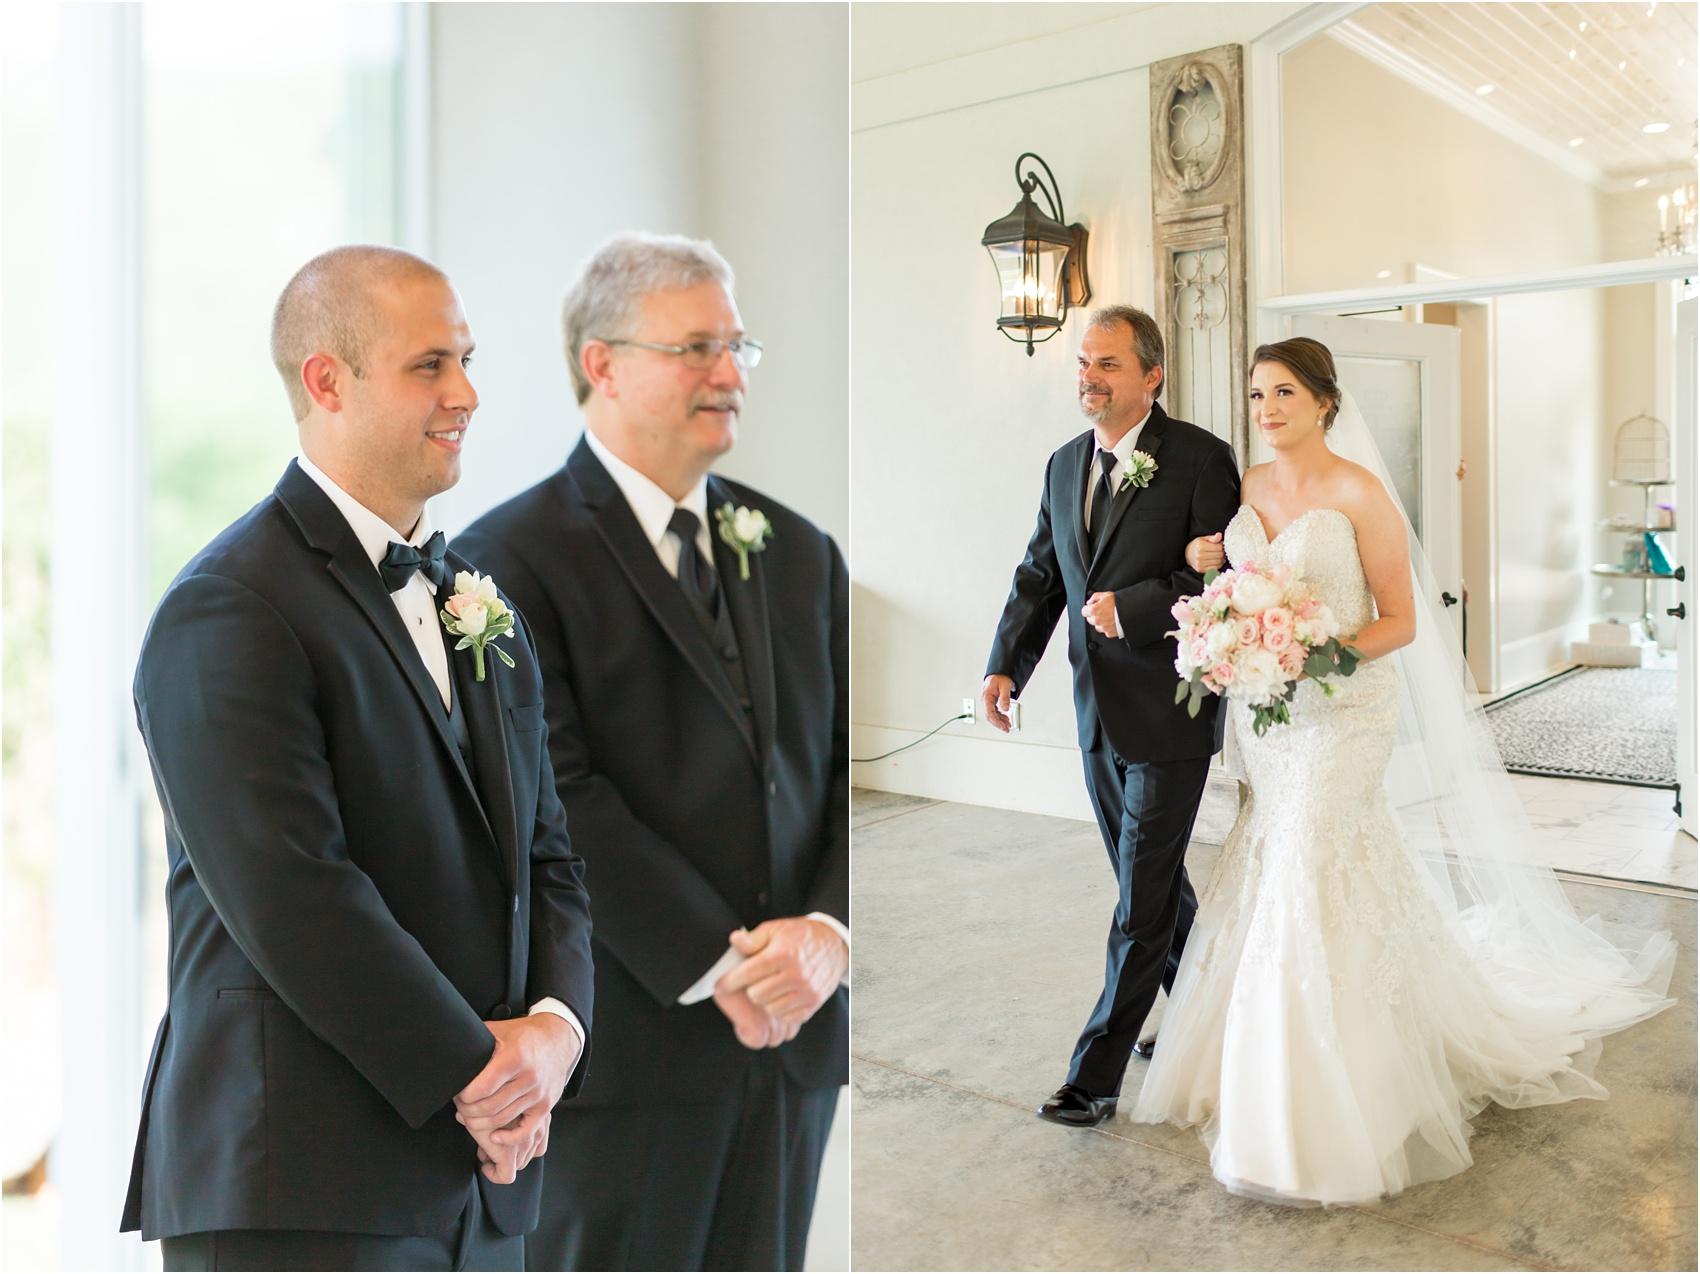 Savannah Eve Photography- Nutt Wedding- Blog-67.jpg